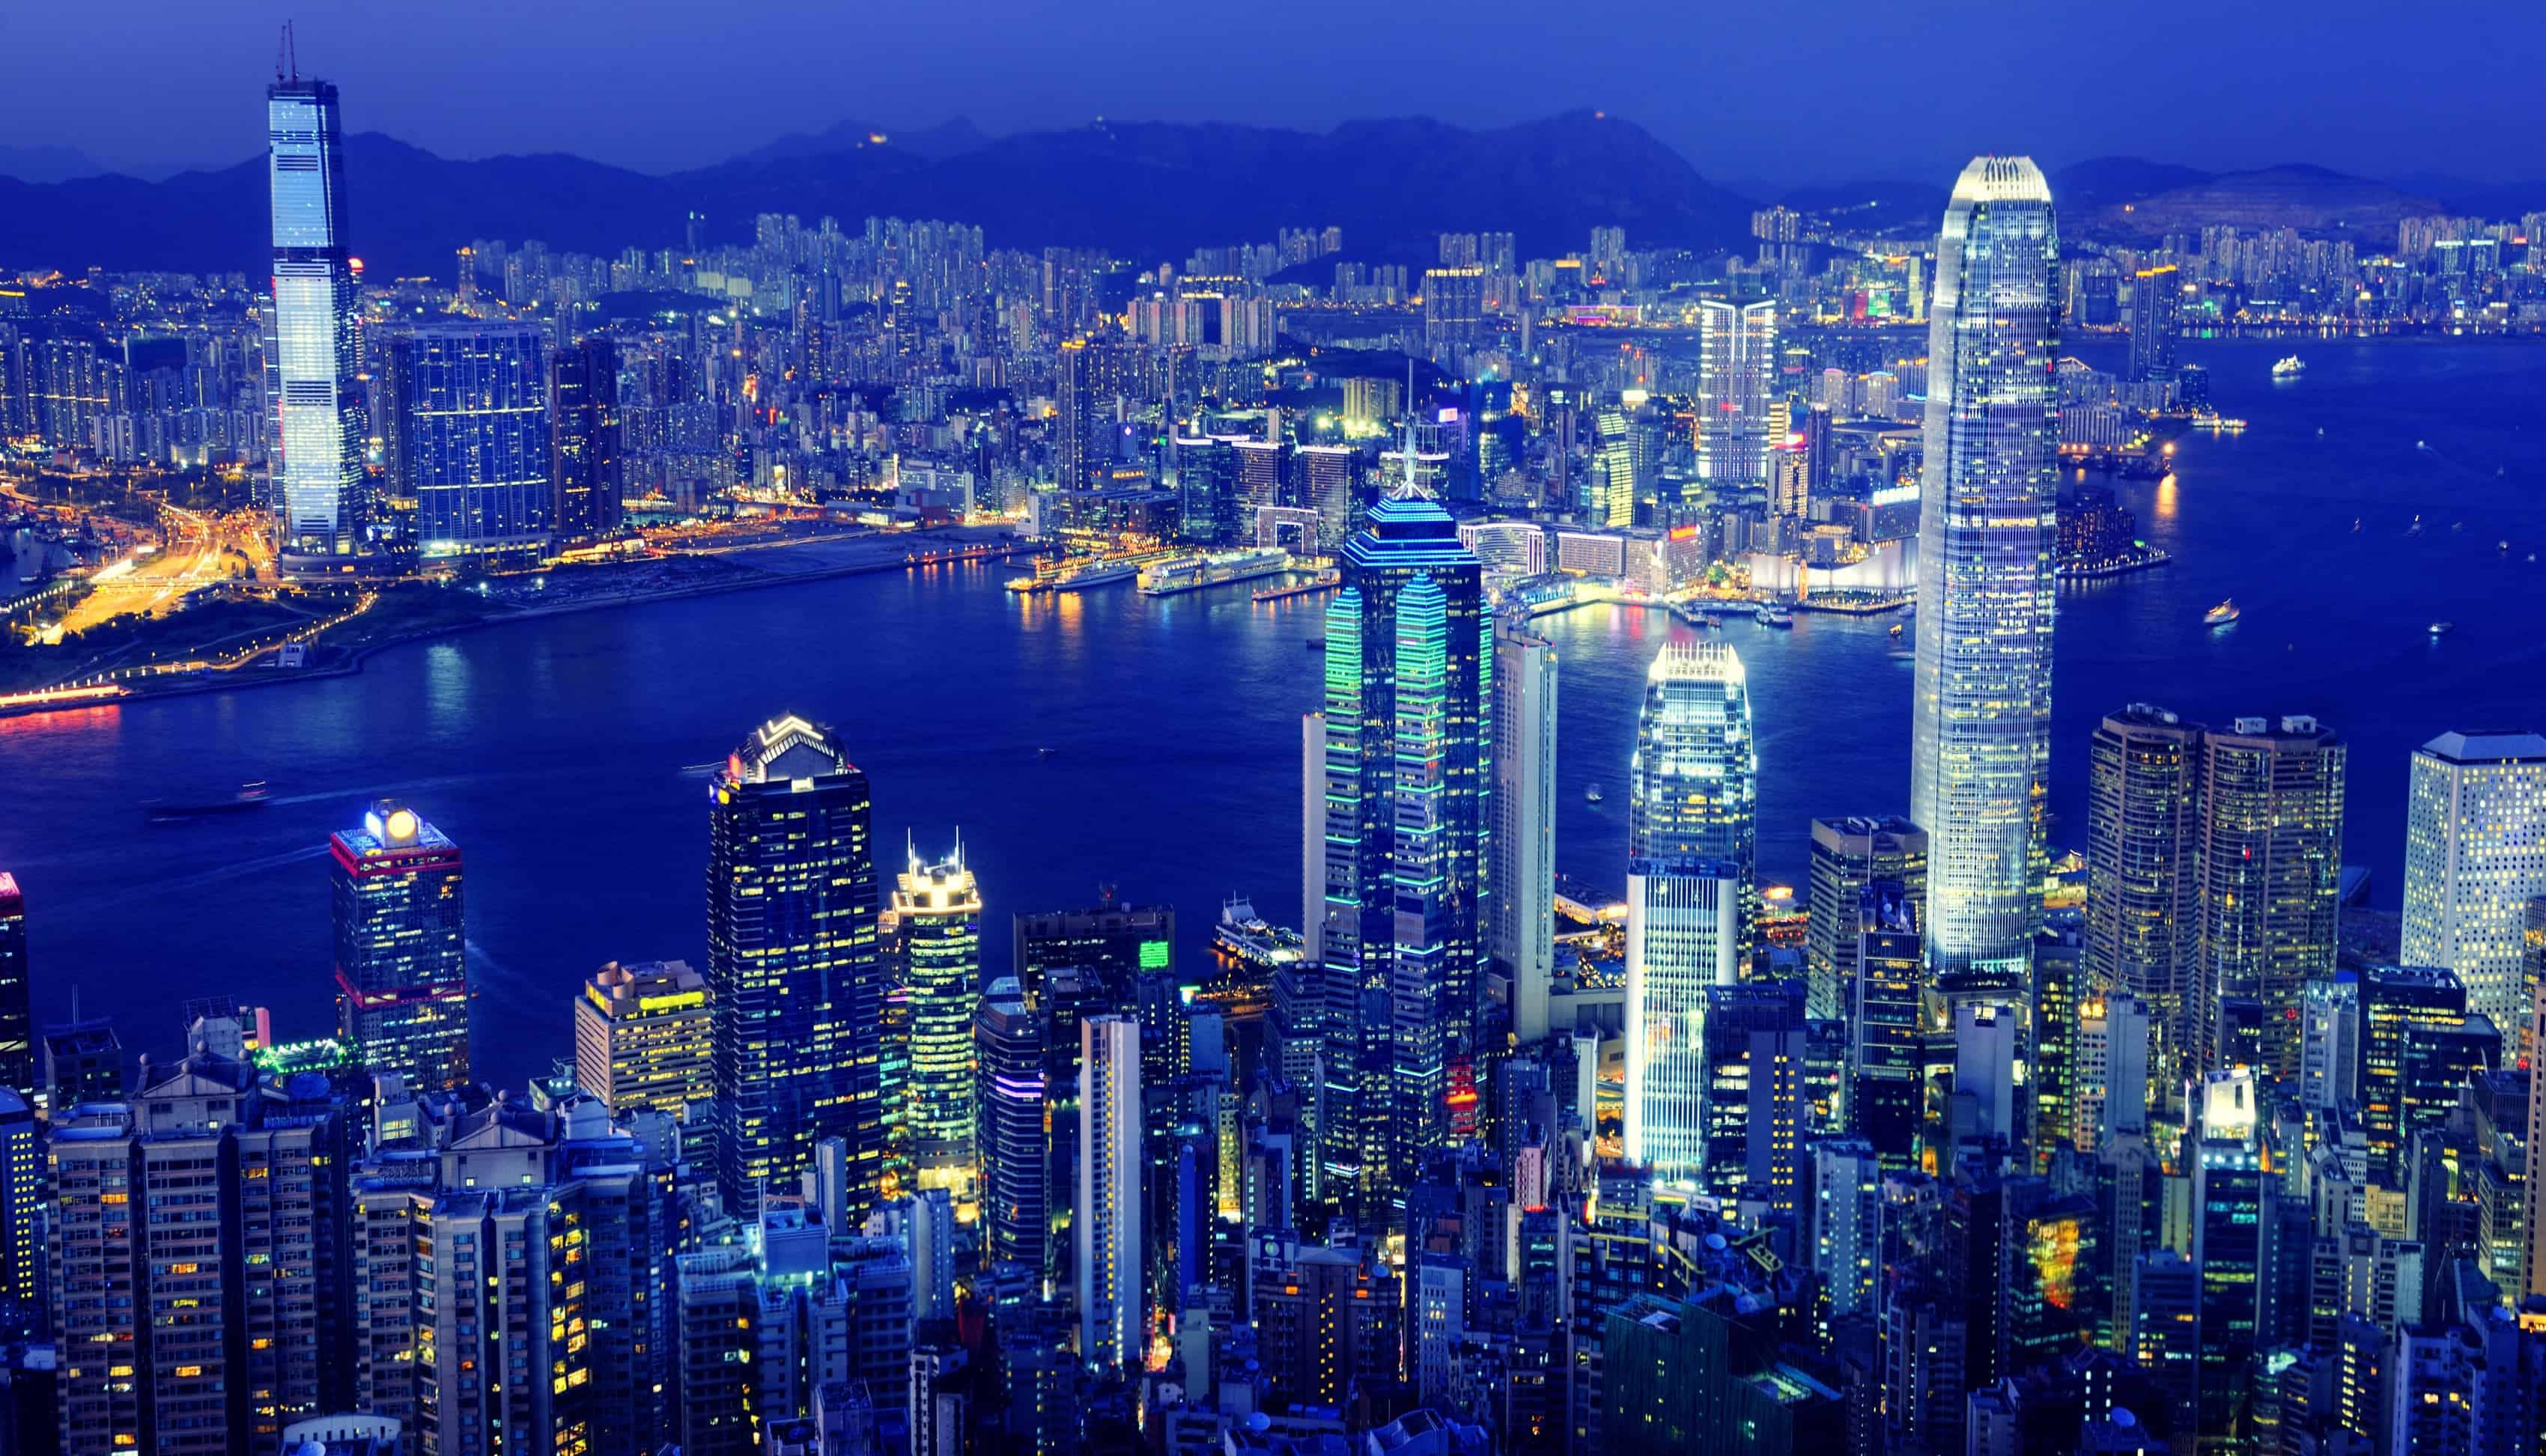 city-scape-buildings-urban-scene-concept